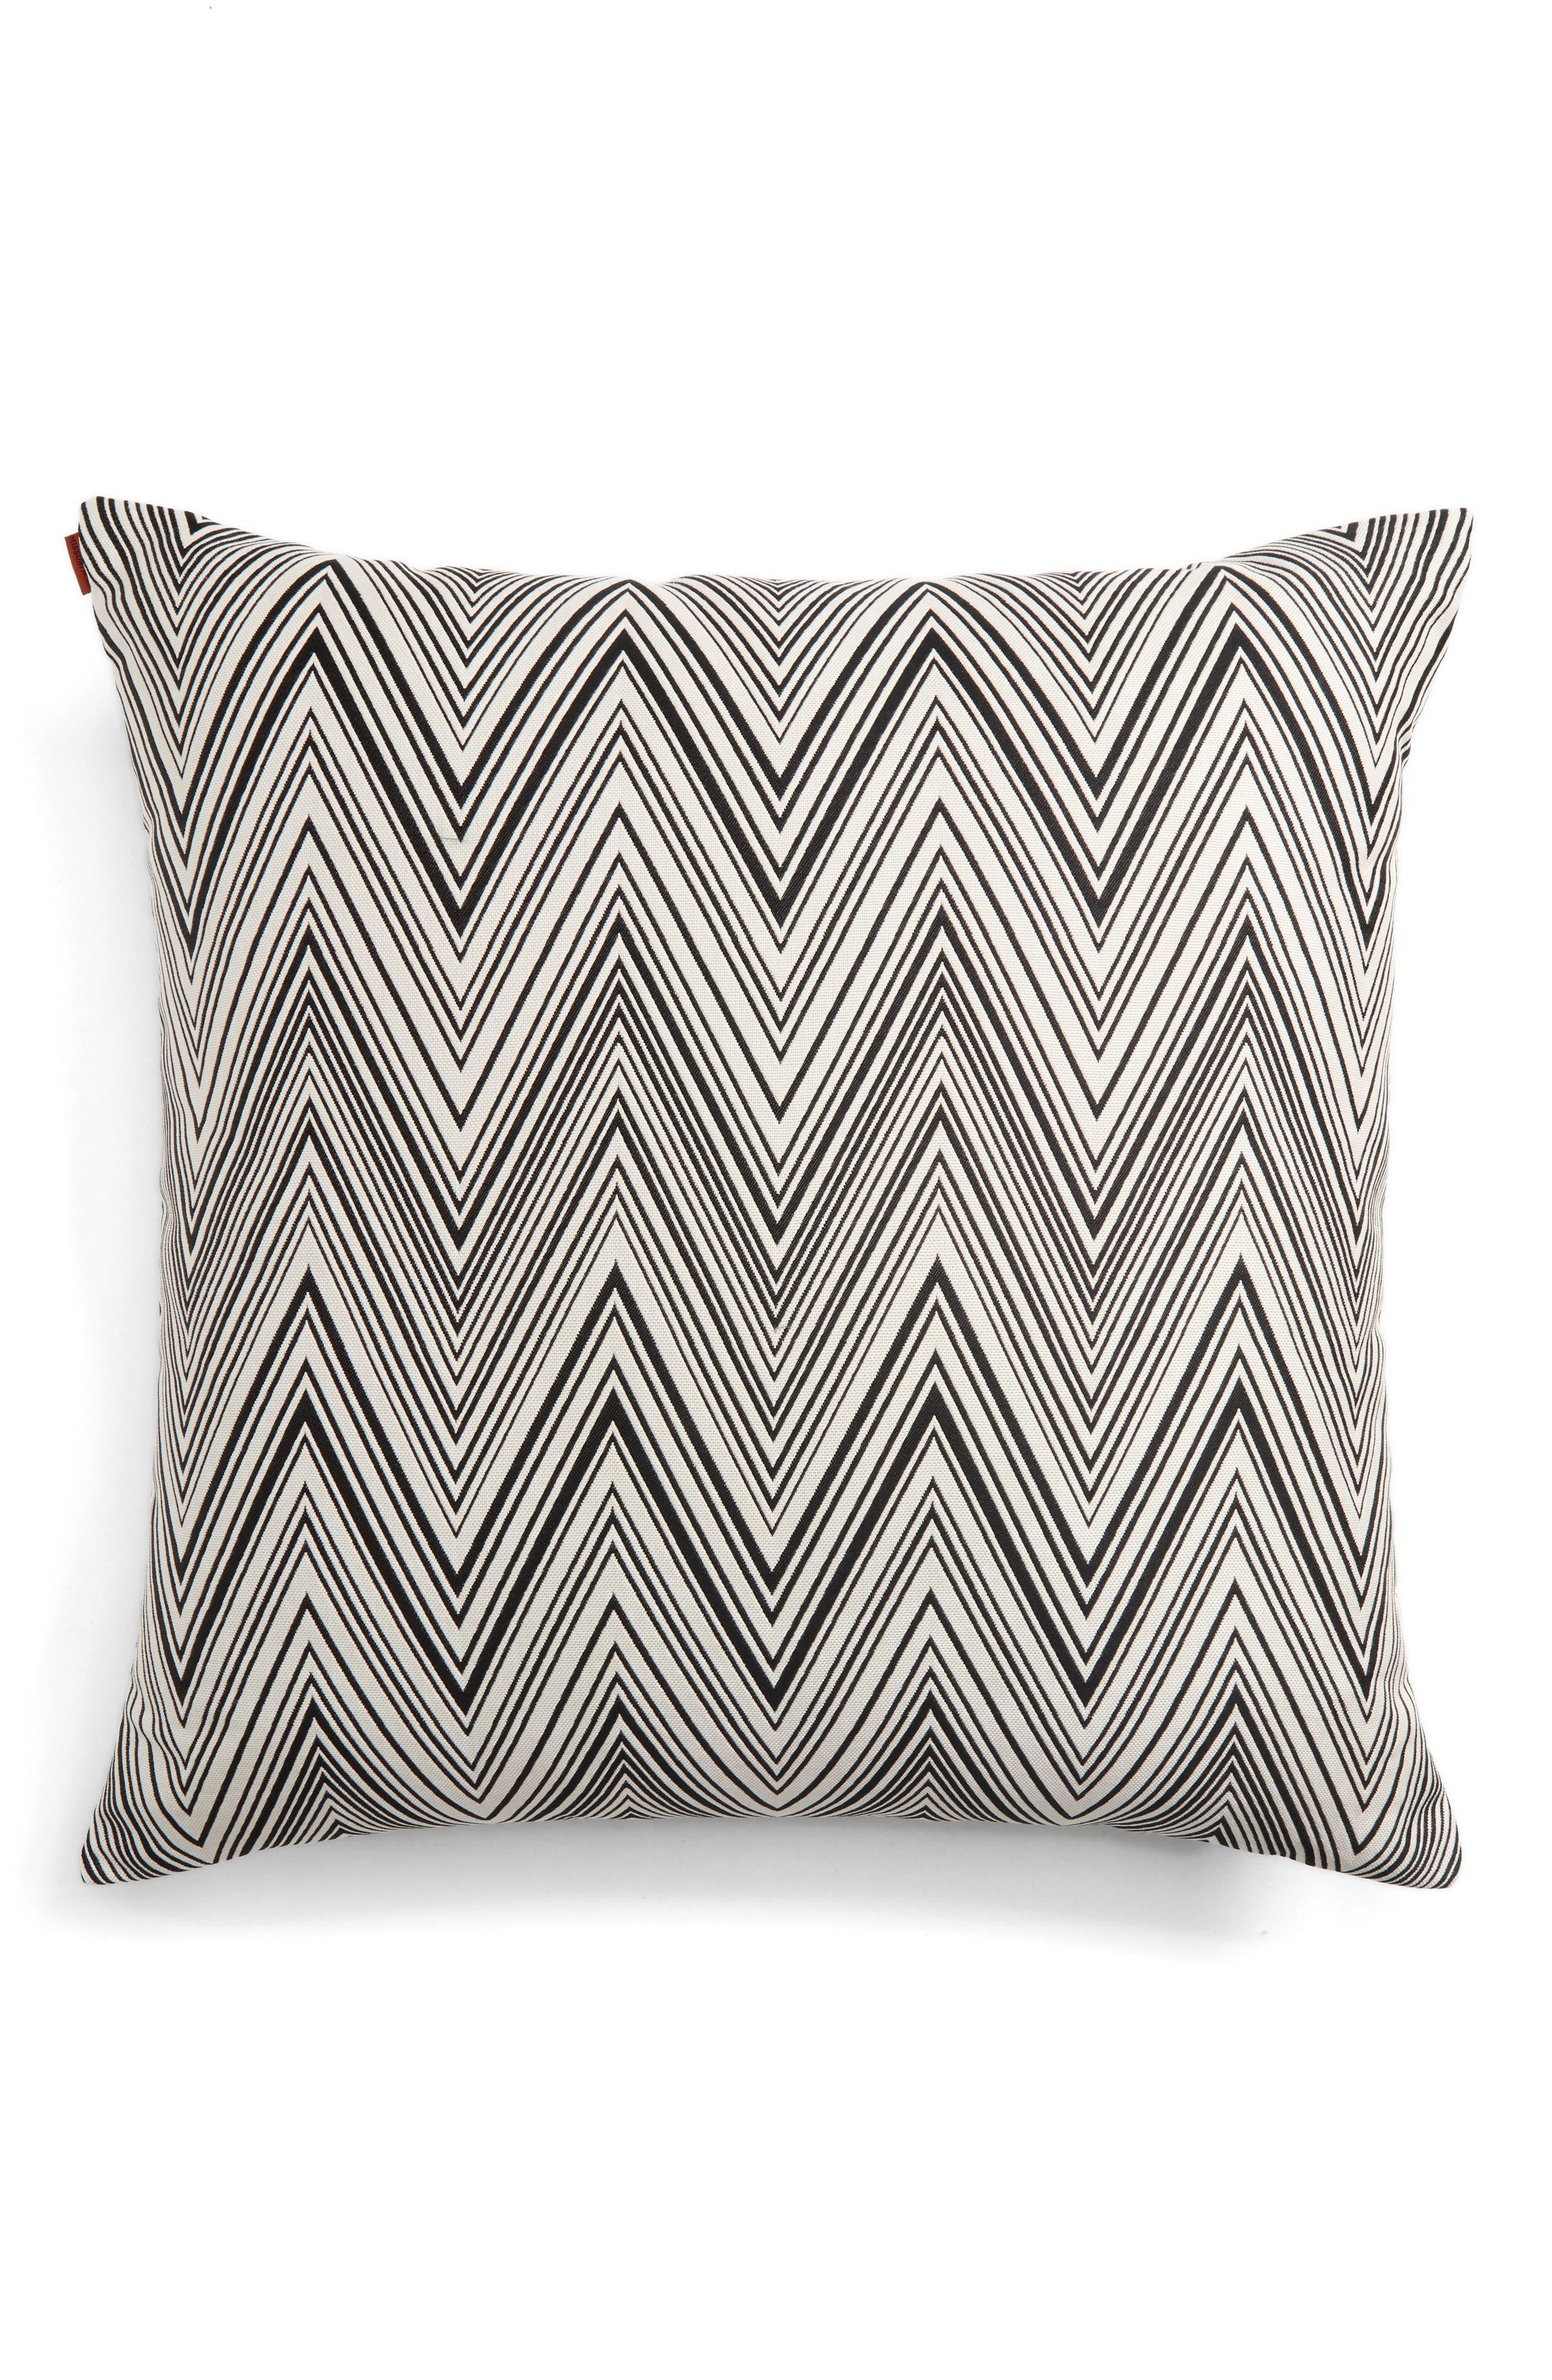 Missoni Chevron Accent Pillow